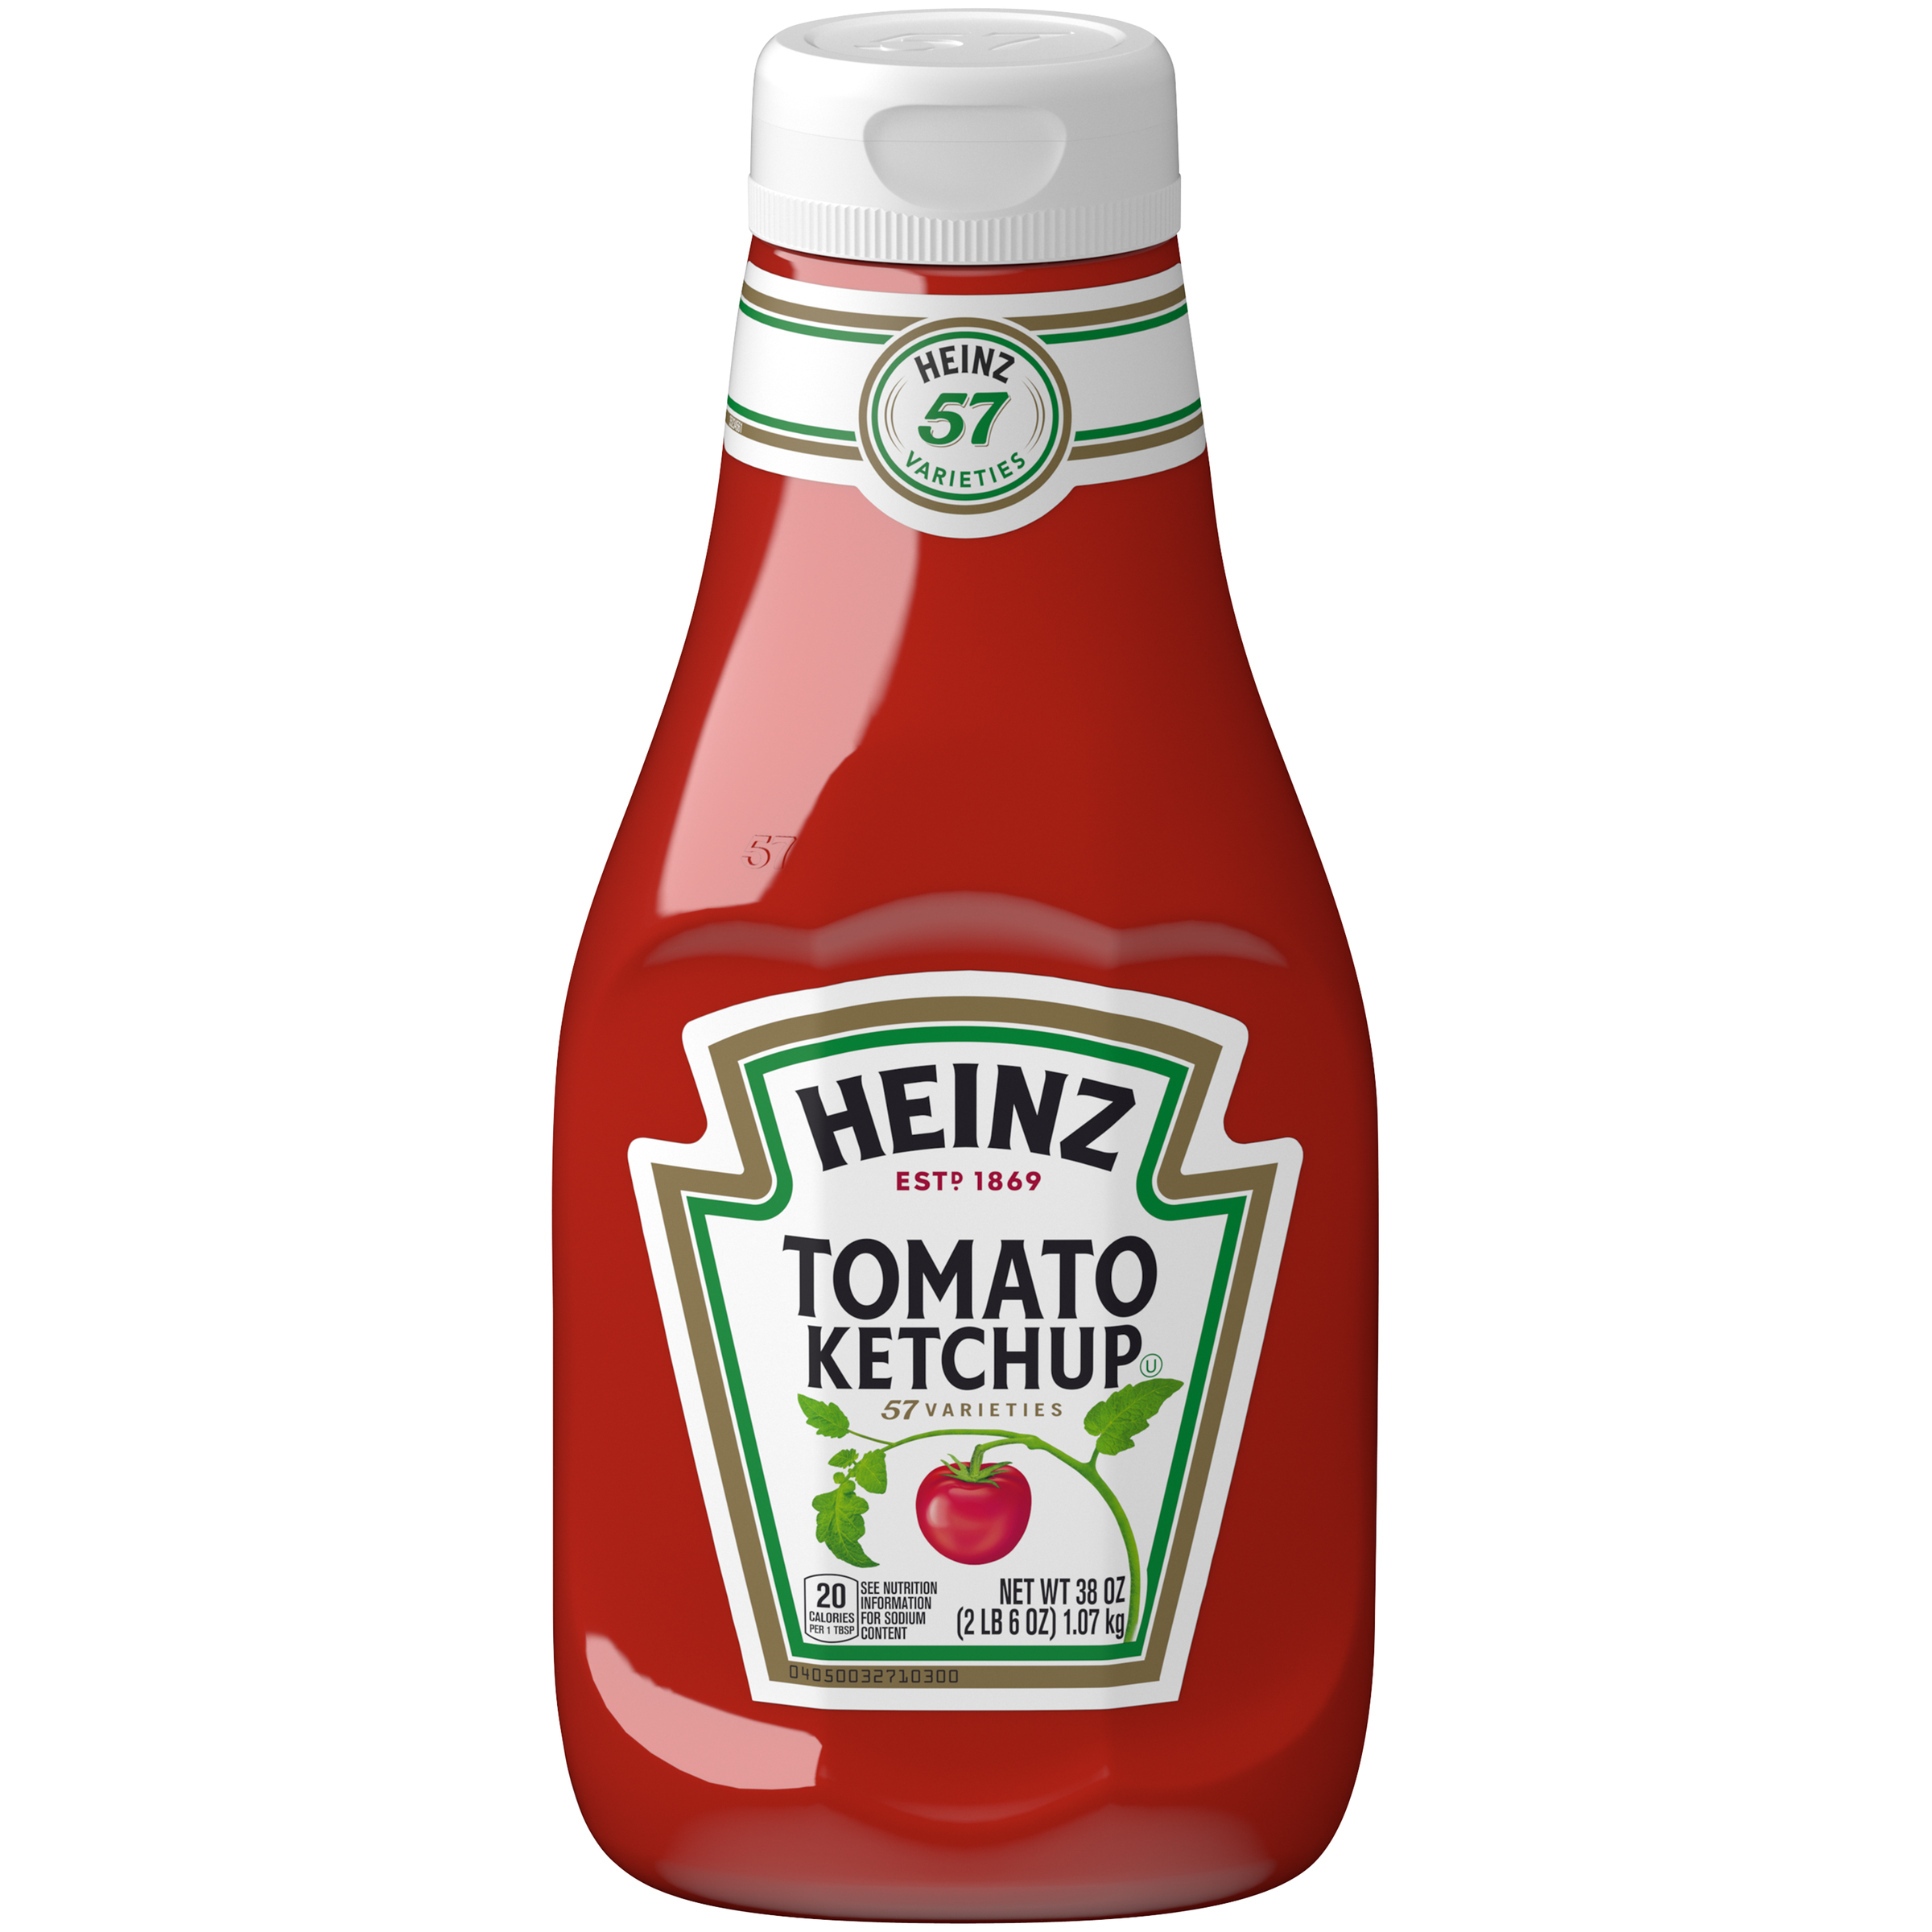 Heinz Tomato Ketchup 38 oz. Bottle image